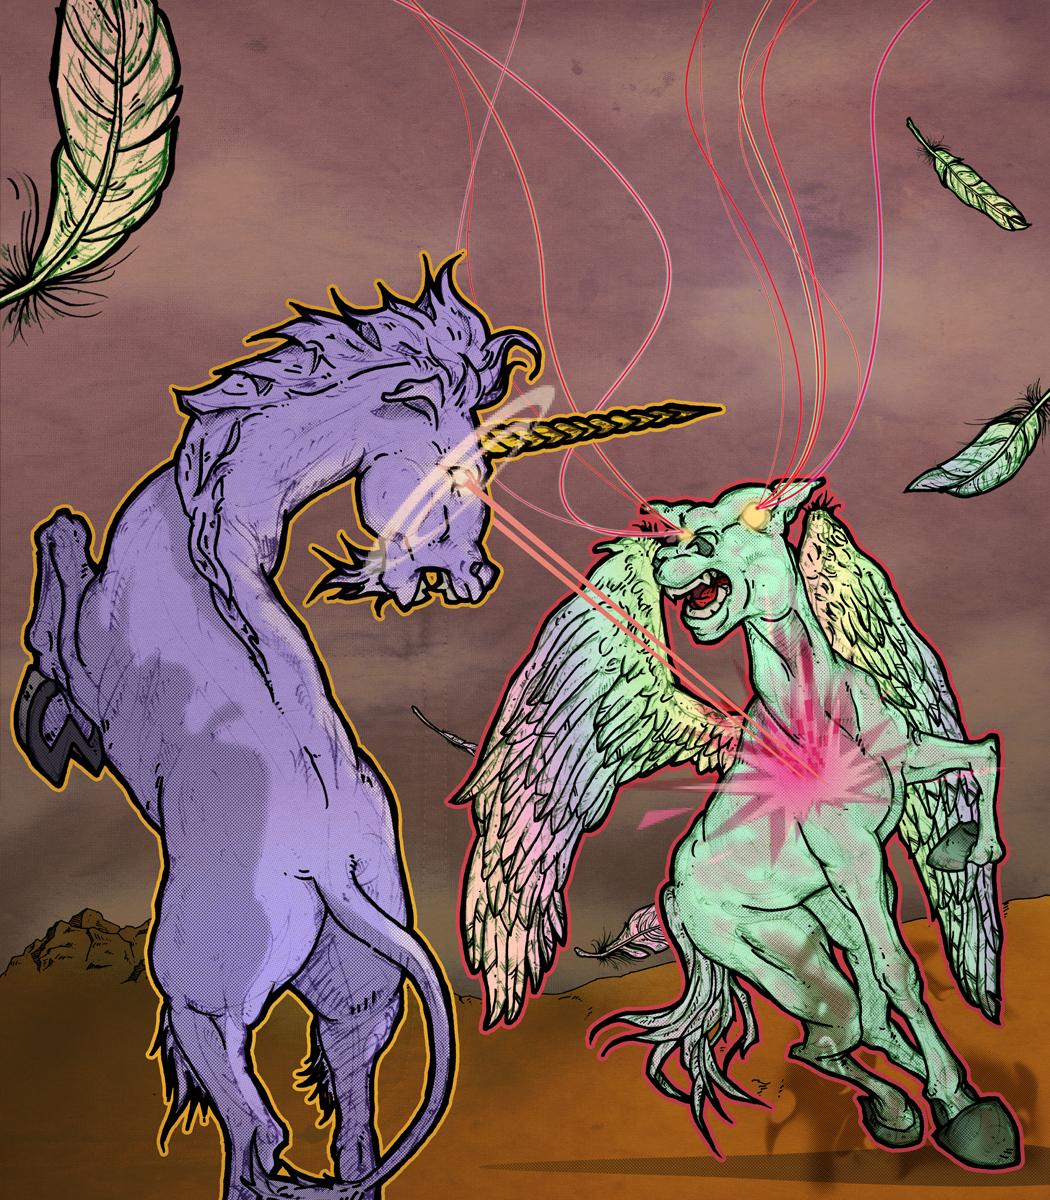 Flying pegasus Vs a unicorn